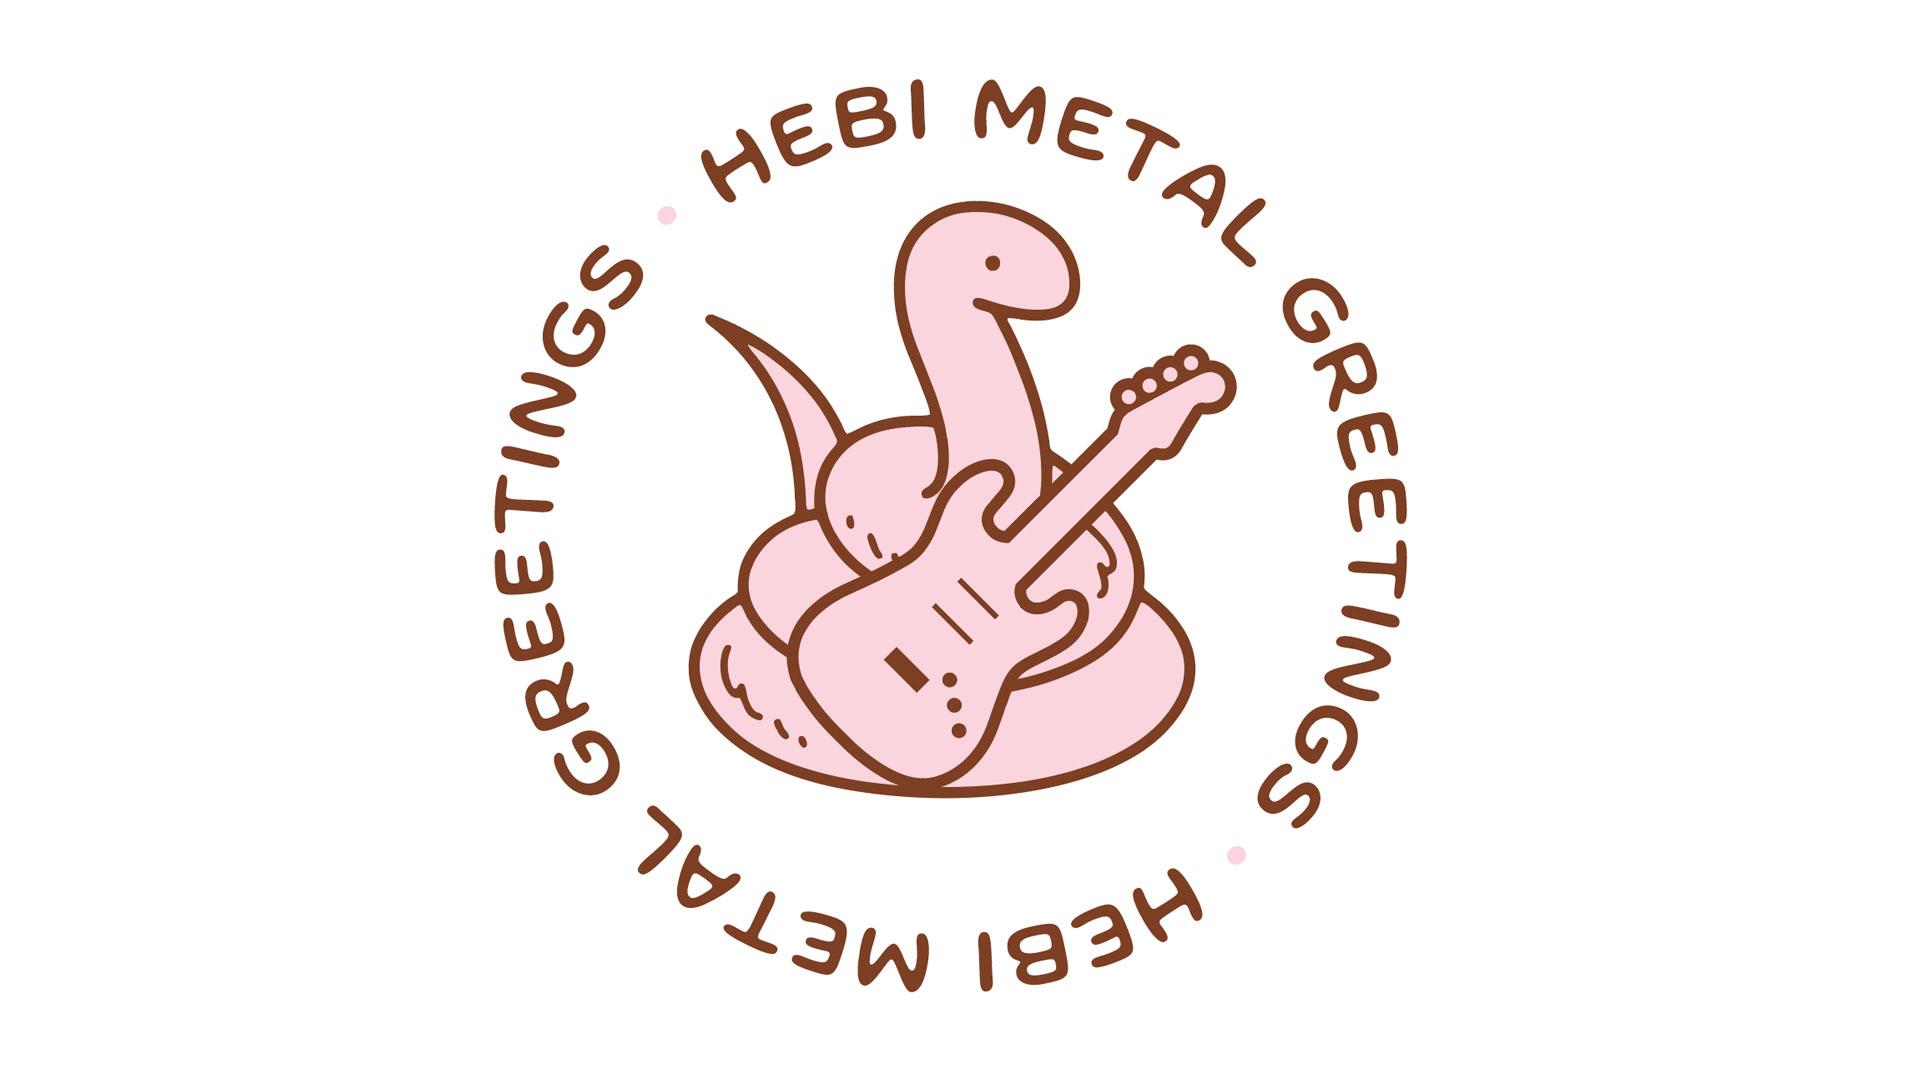 Hebi Metal Greetings